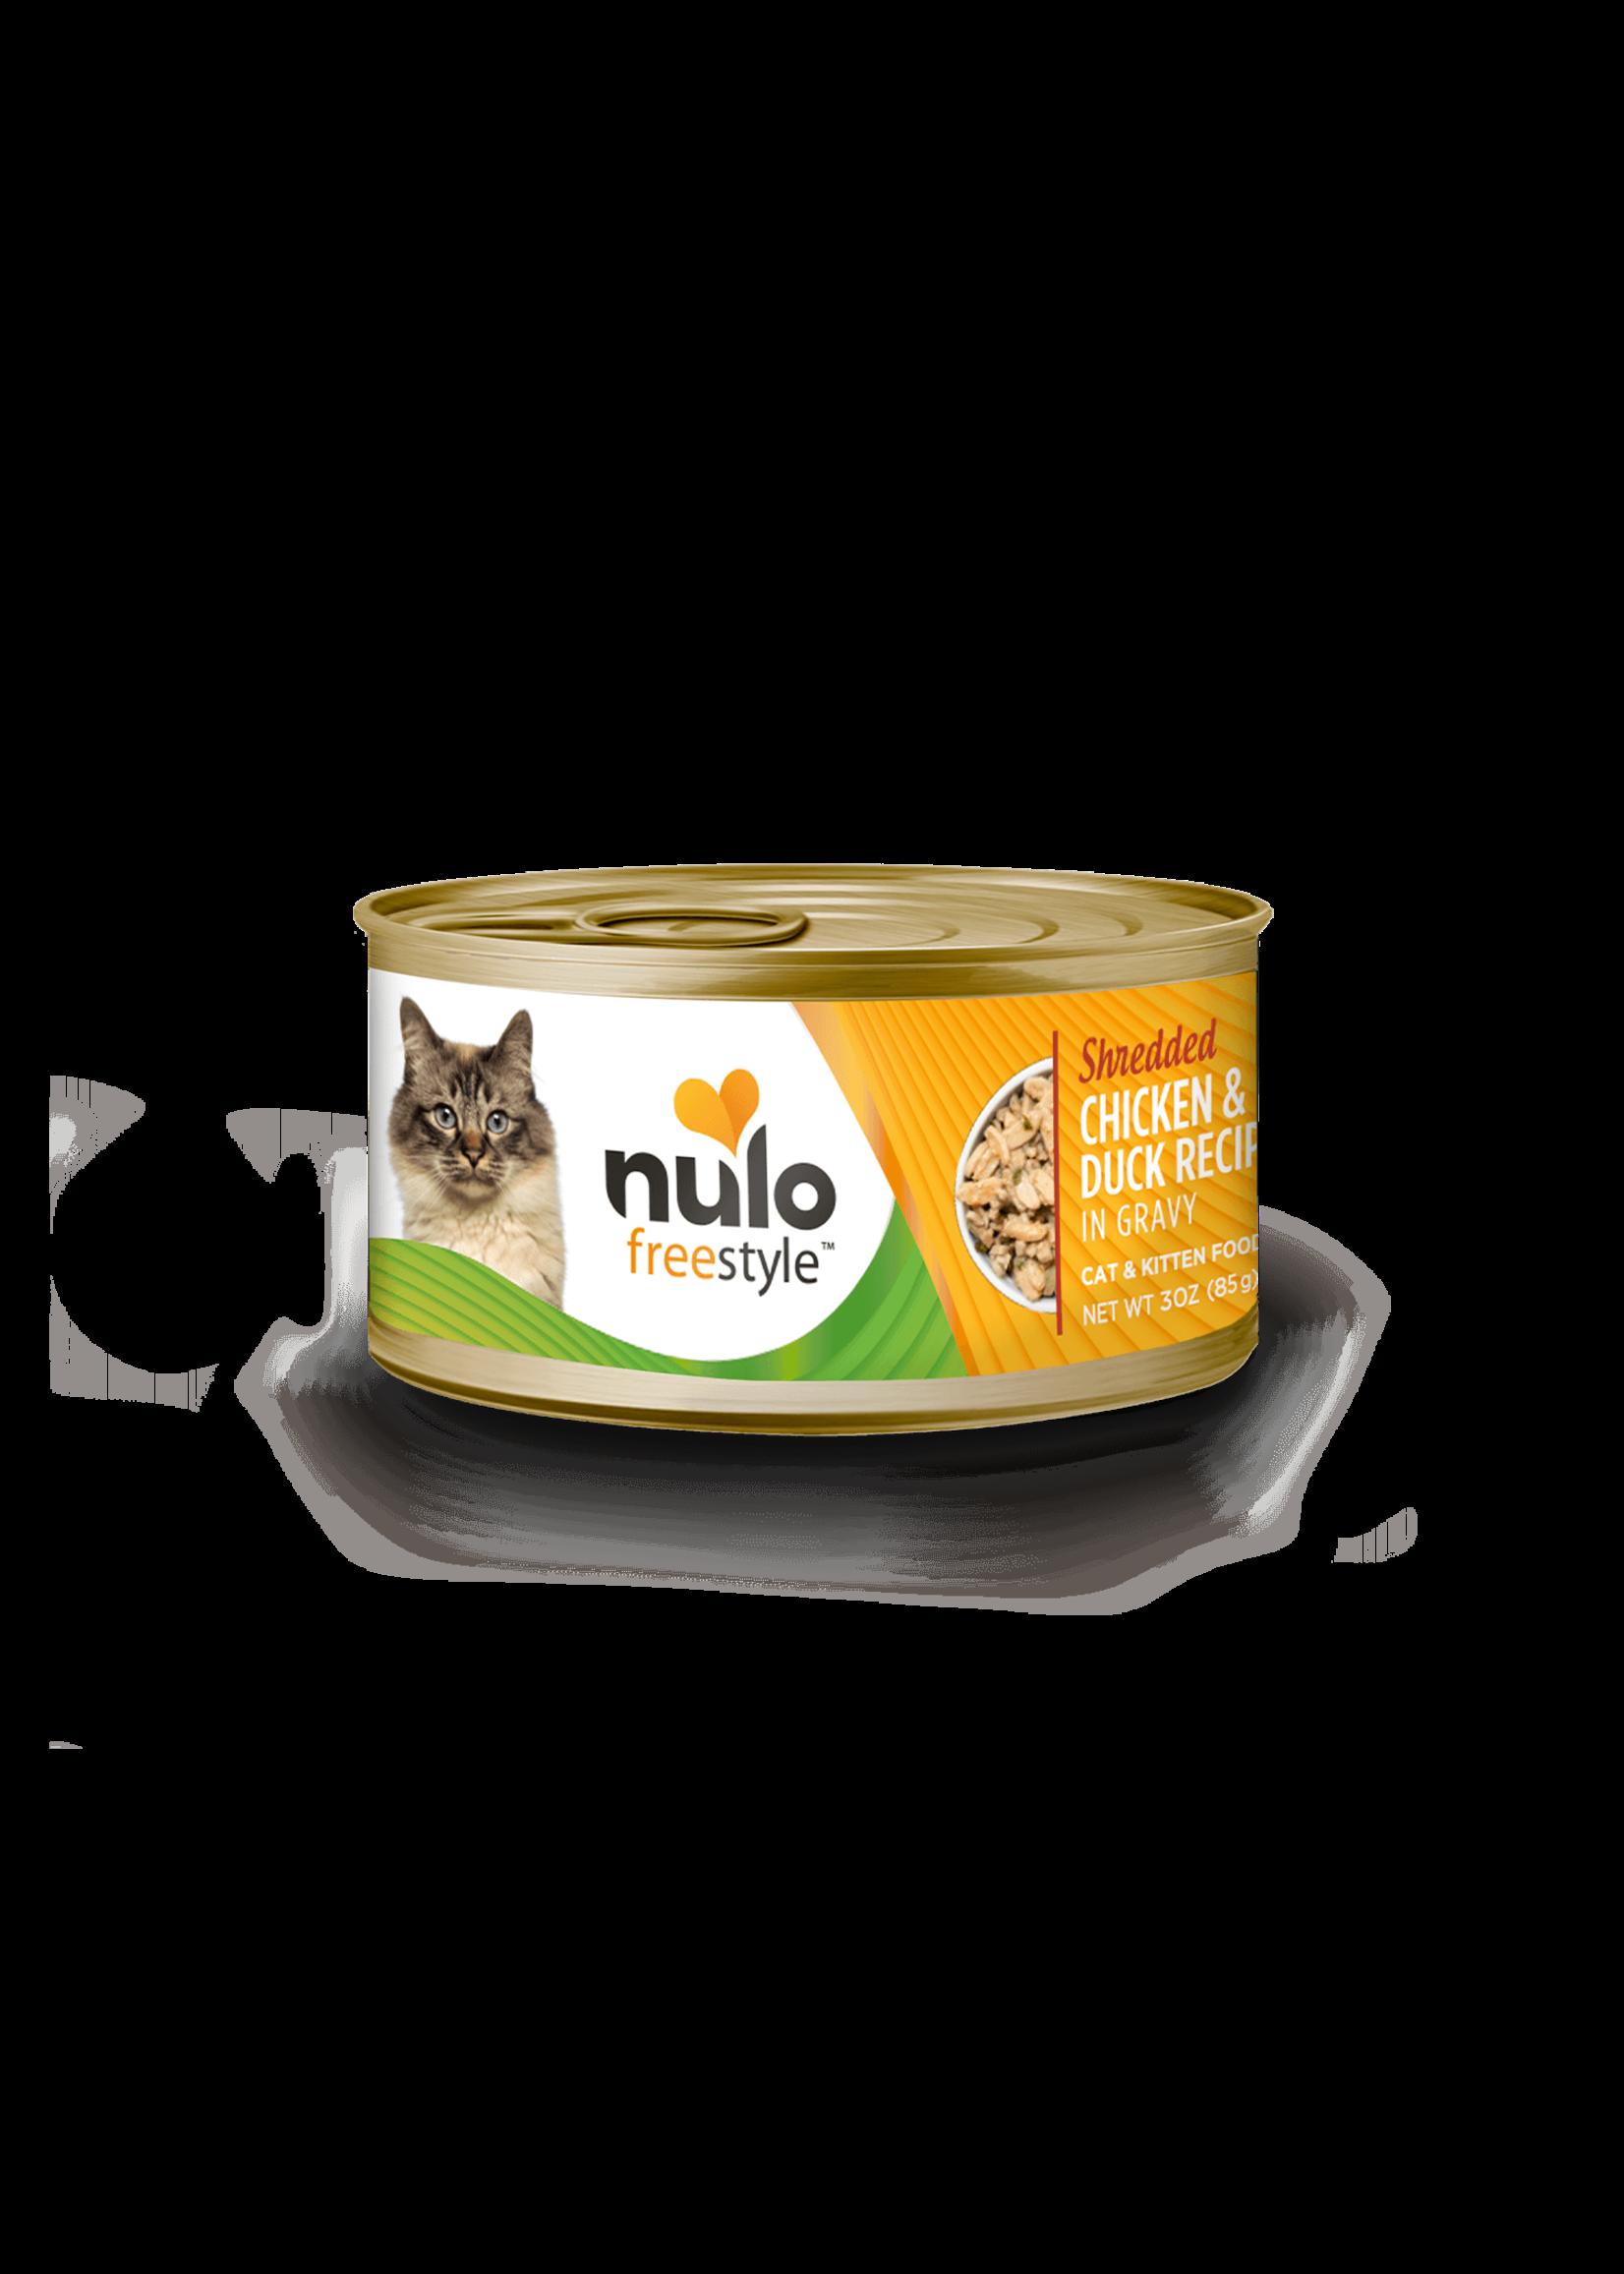 Nulo Nulo FreeStyle Wet Cat Food Shredded Chicken & Duck in Gravy